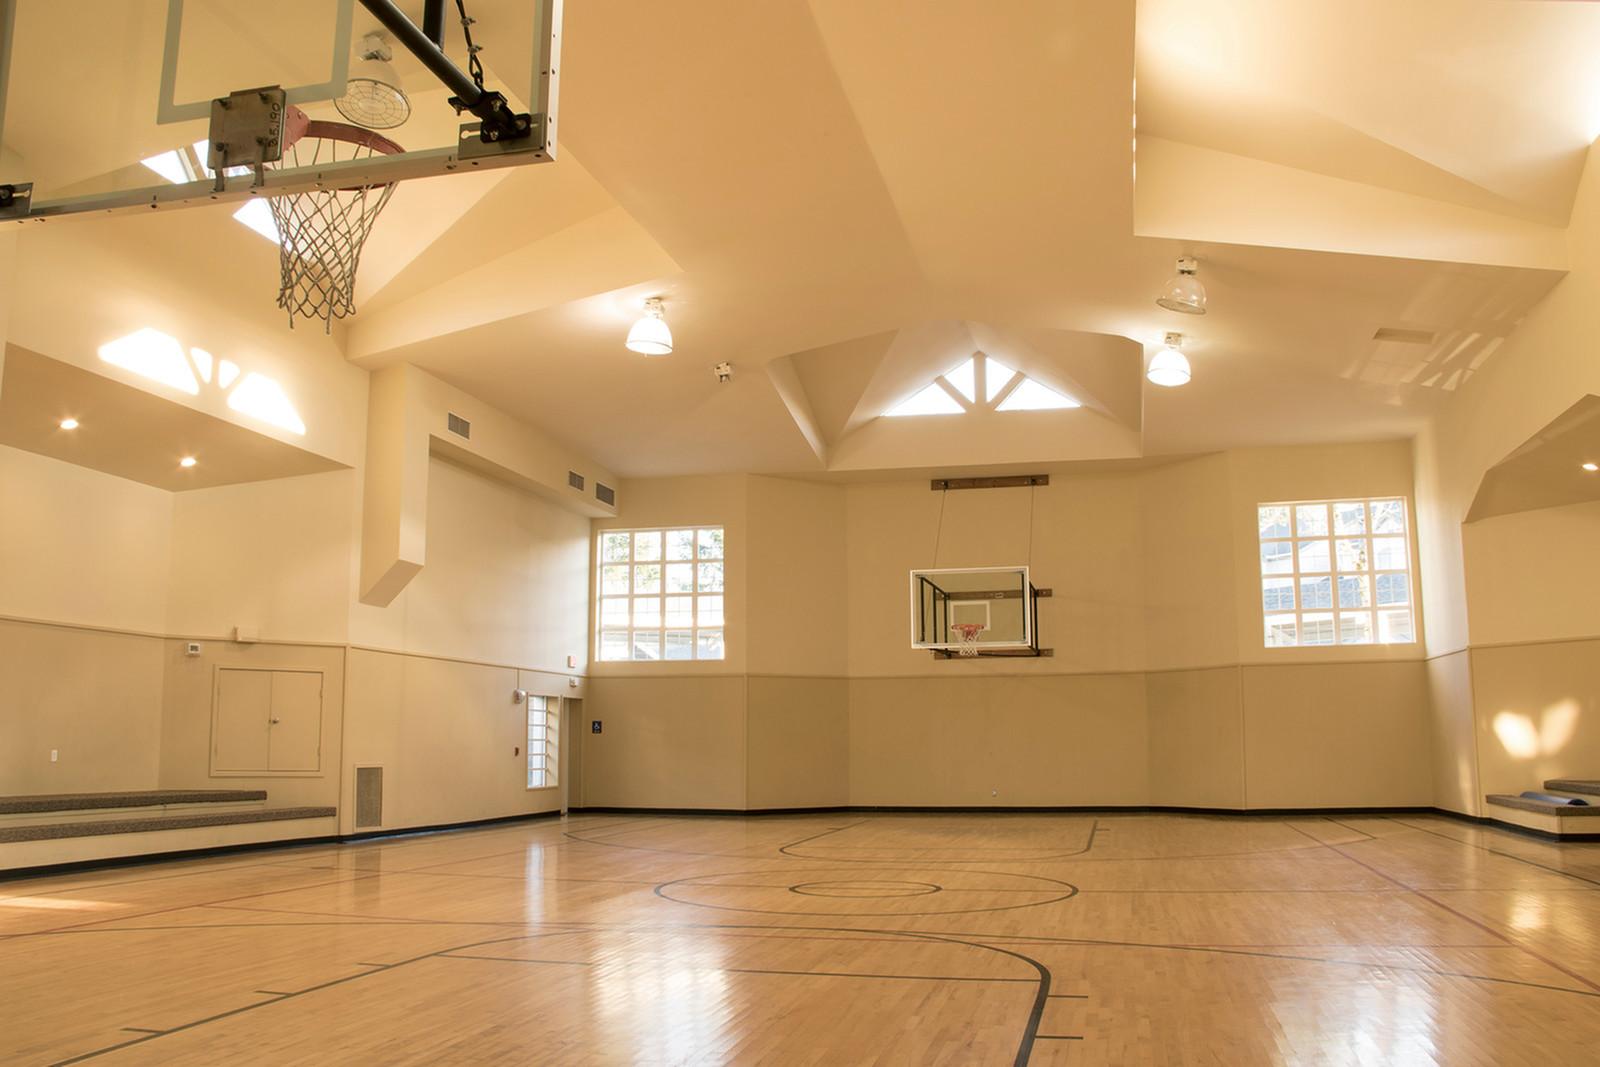 Canyon Park Basketball Court | Puyallup WA Apartments For Rent | Canyon Park